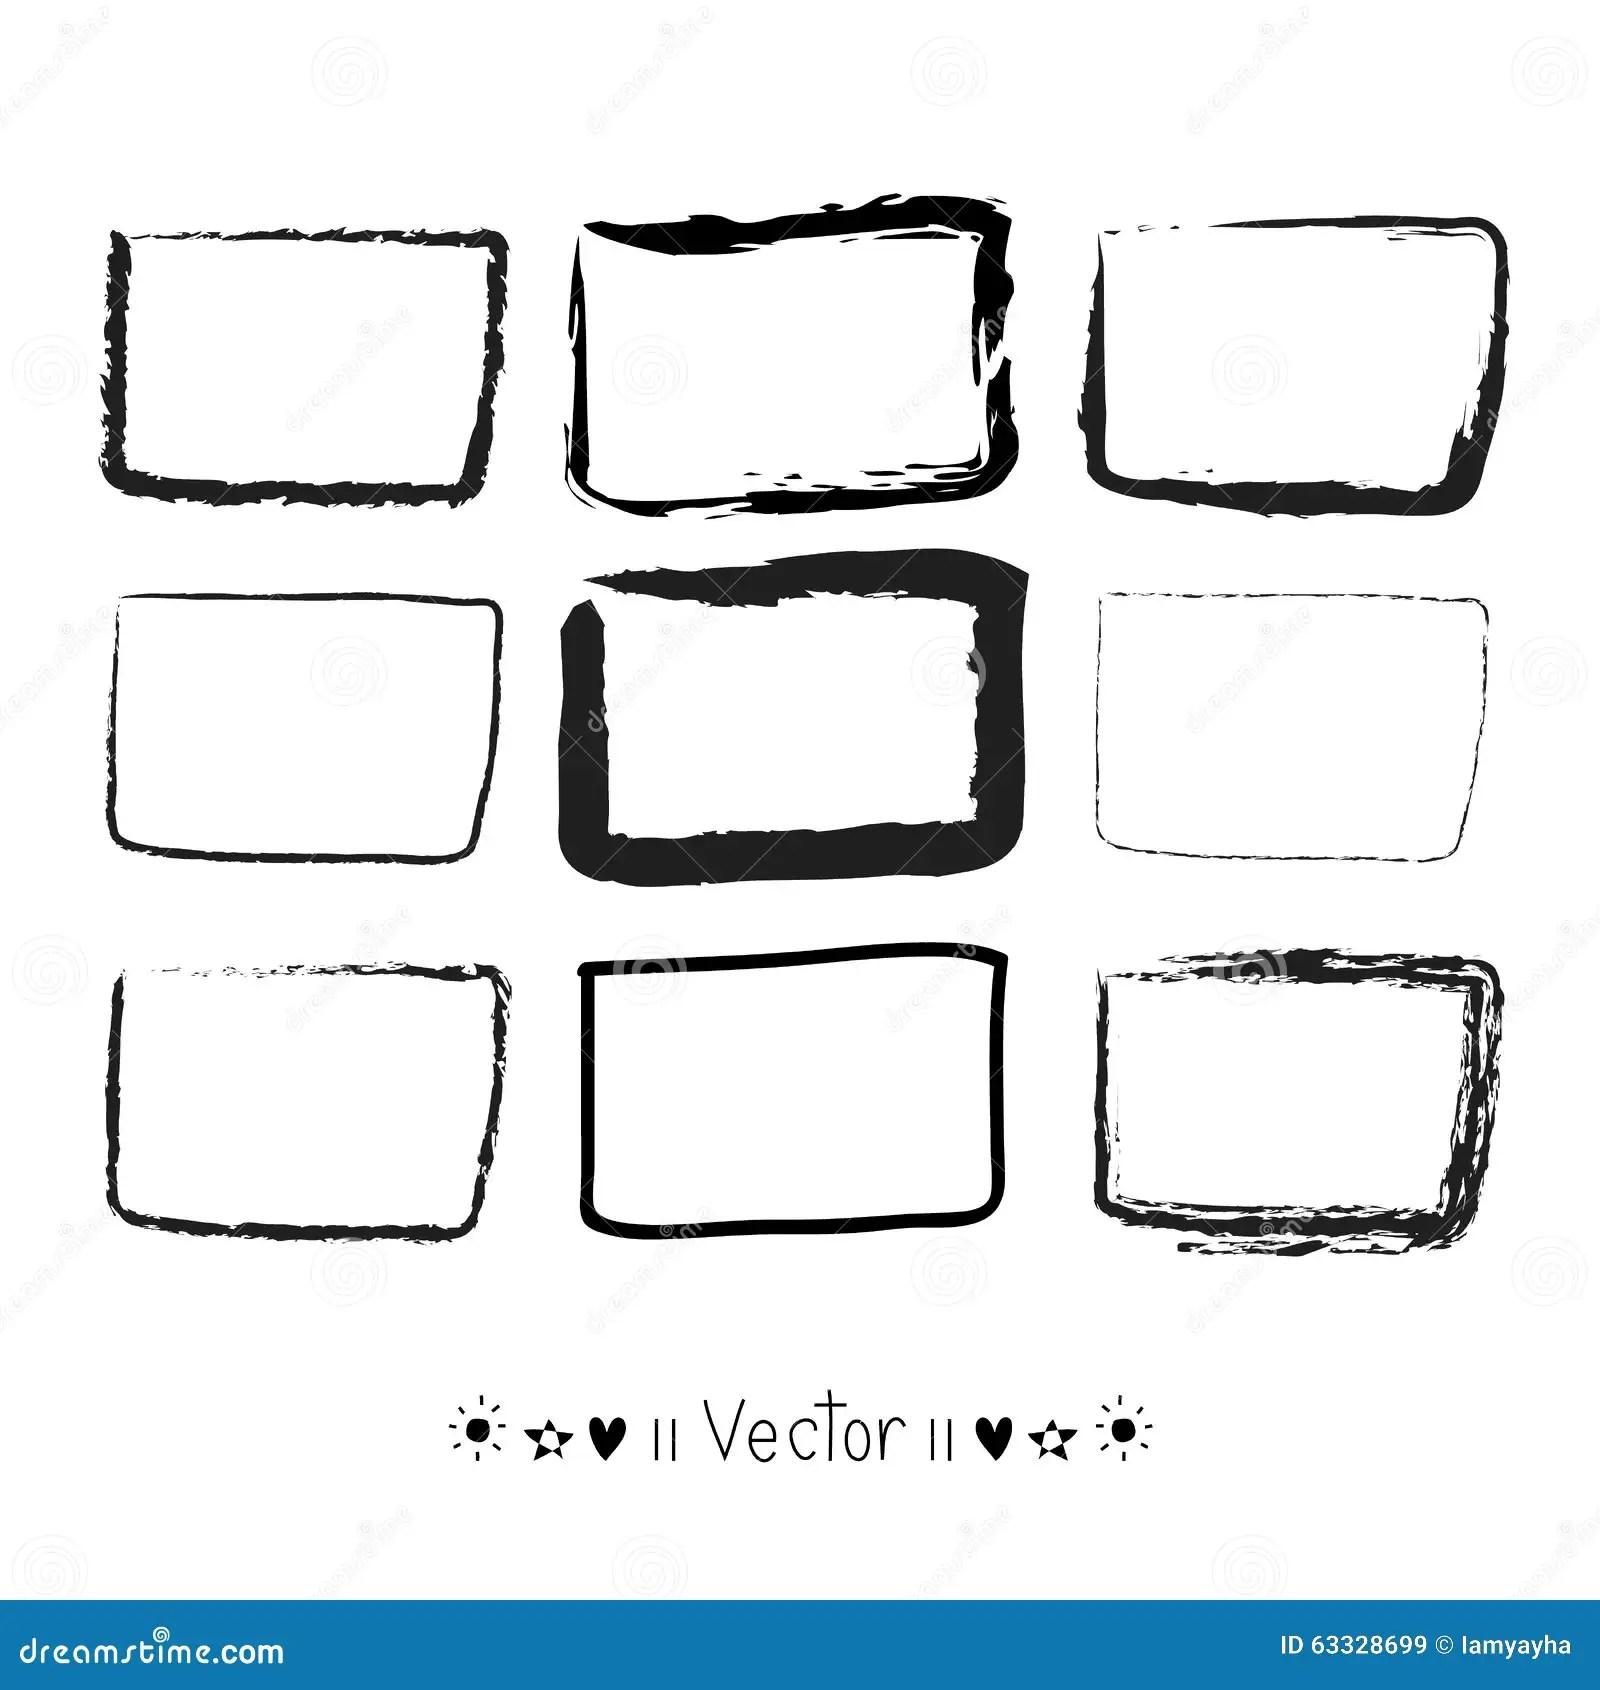 Vector Set Hand Drawn Rectangle Felt Tip Pen Objects